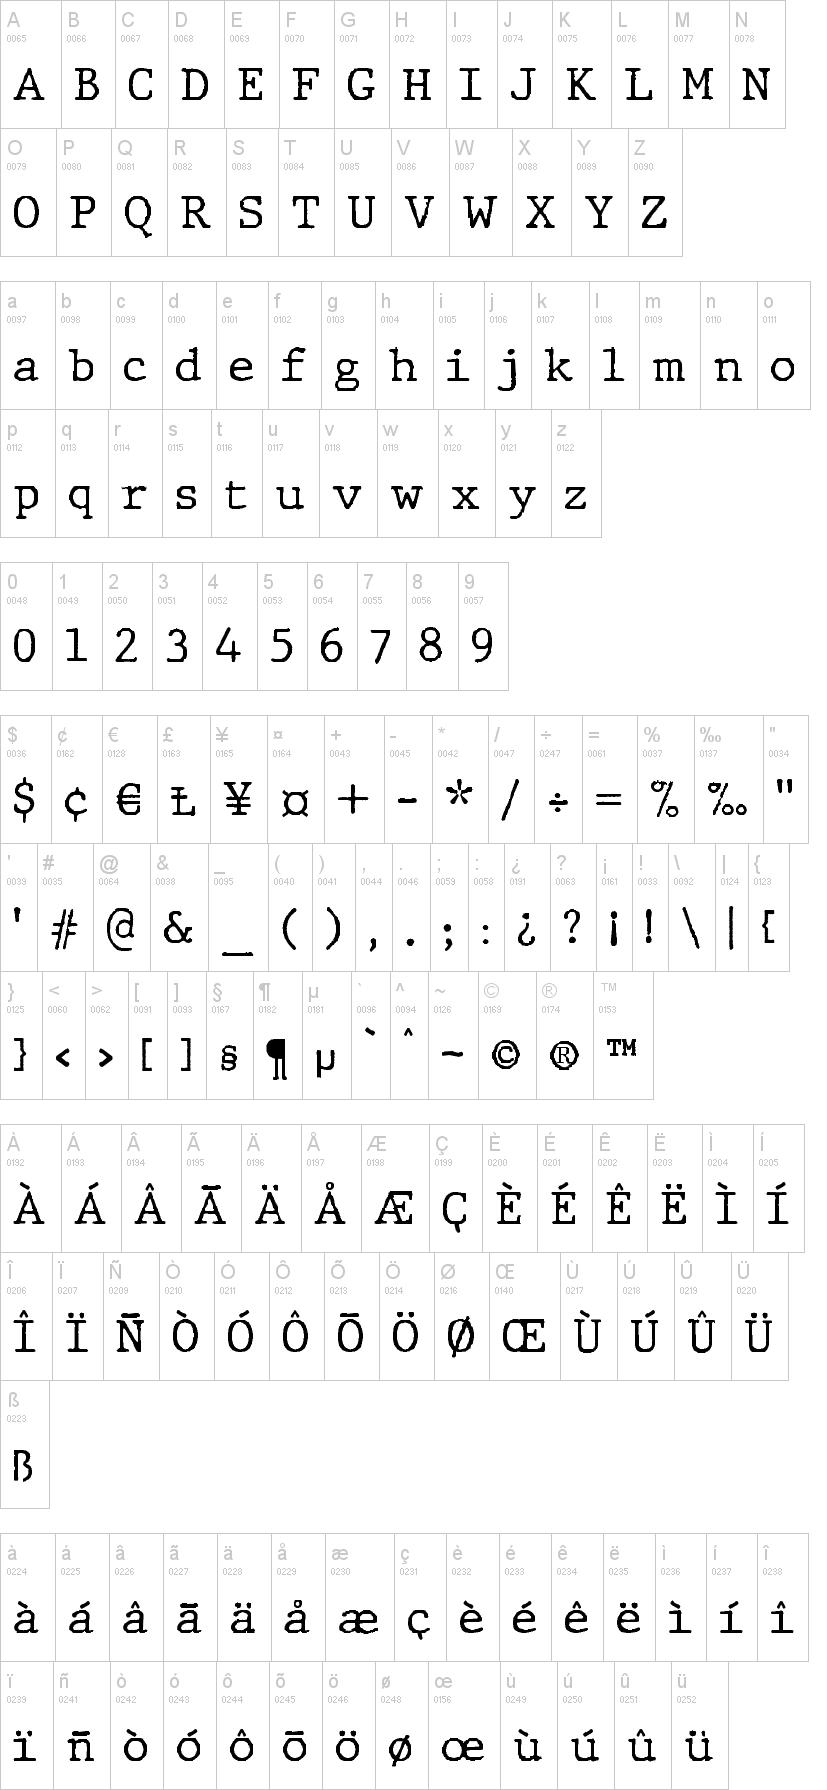 JMH Typewriter Font Family-1